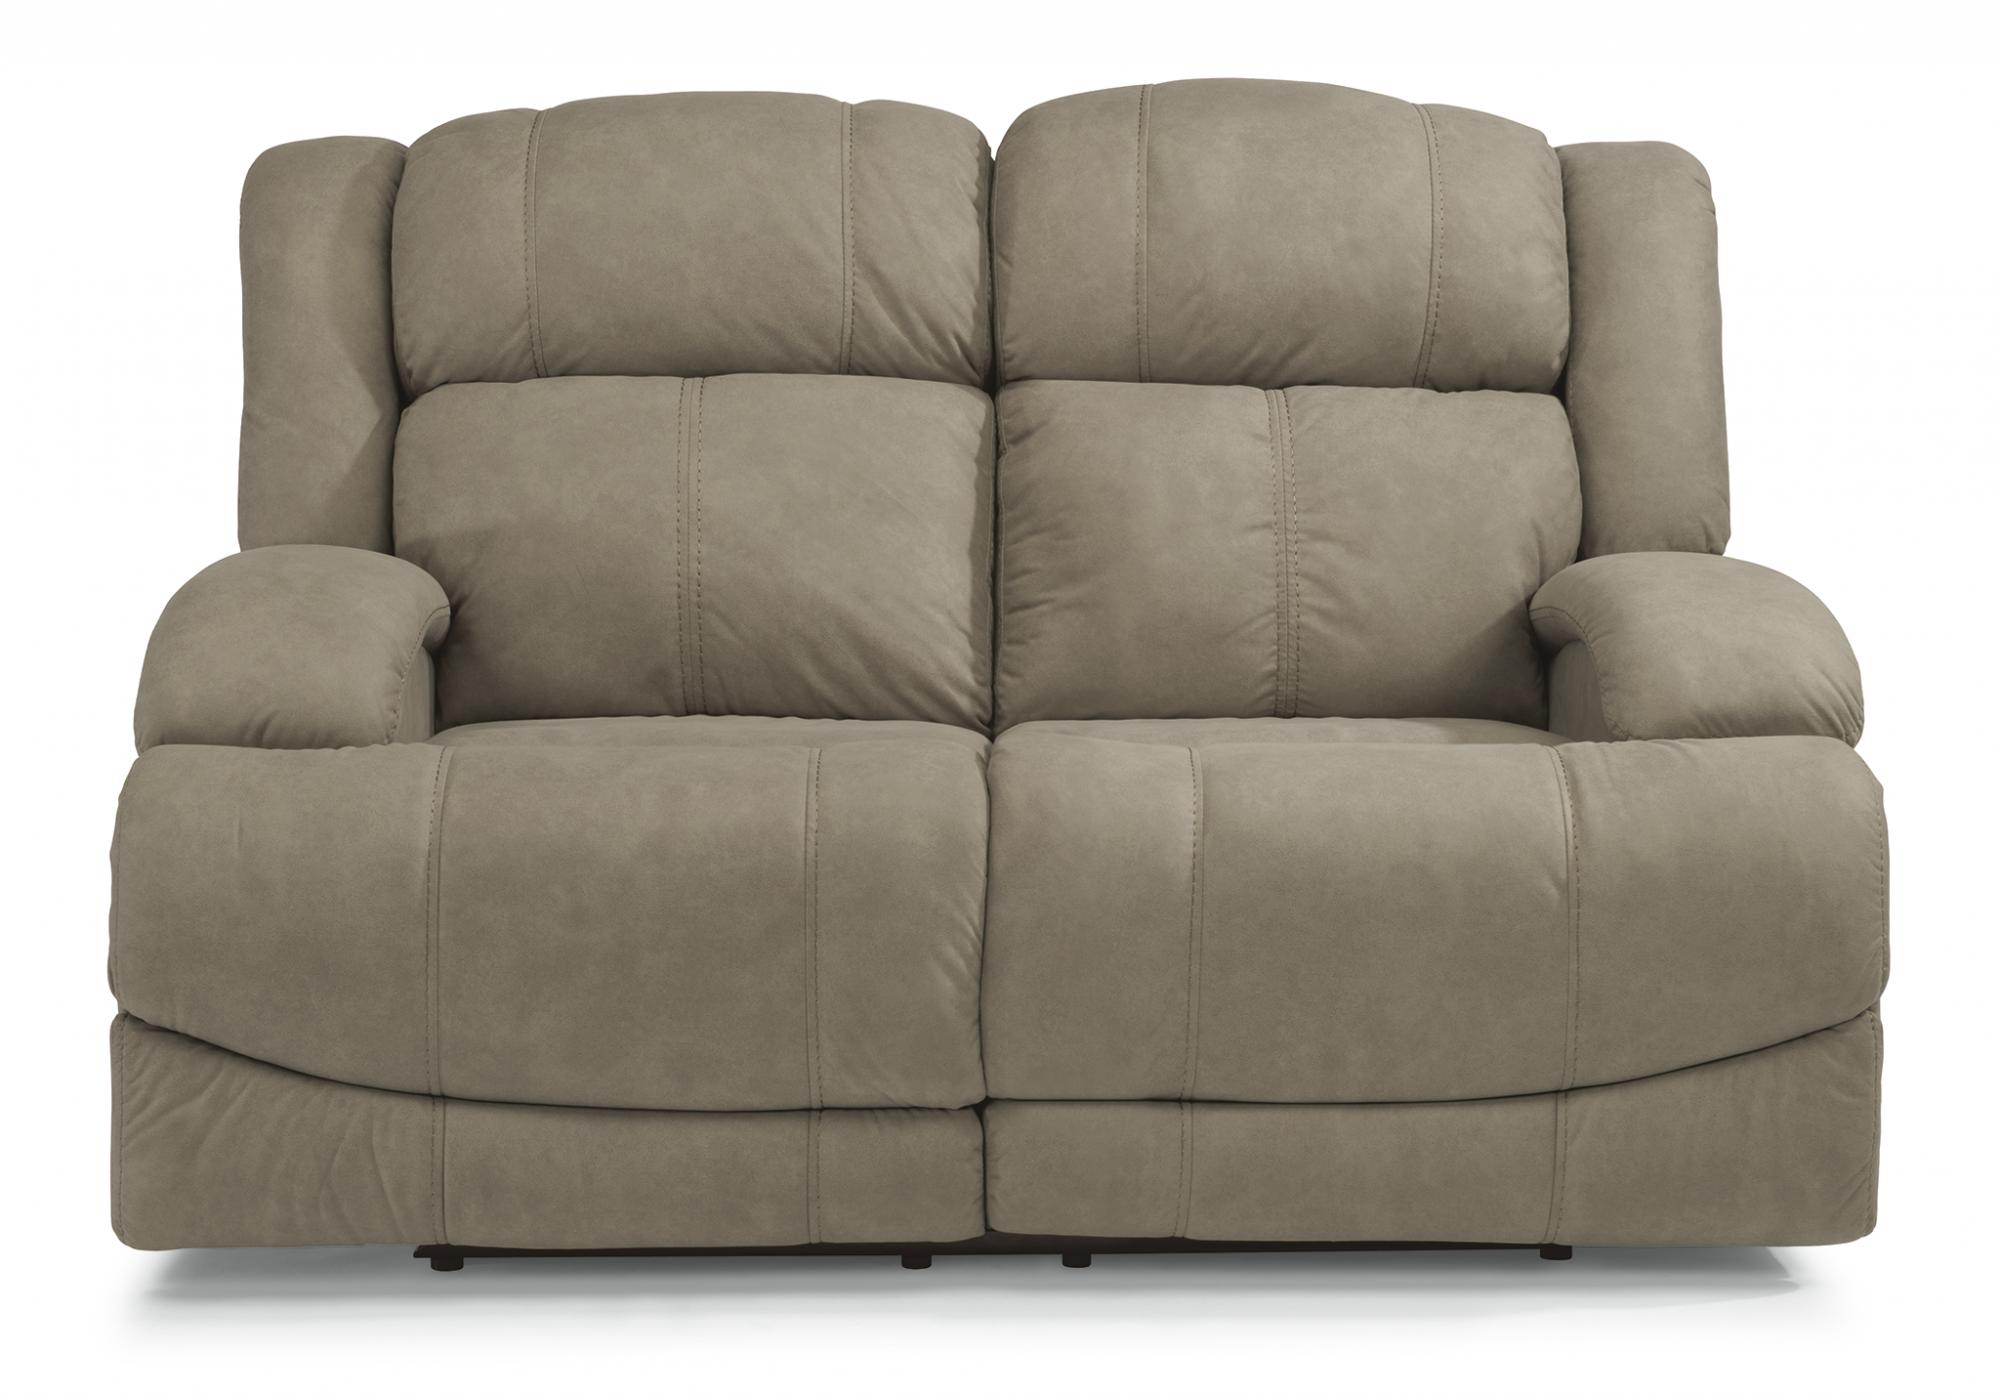 Outstanding Flexsteel Craig Appliance And Furniture Machost Co Dining Chair Design Ideas Machostcouk